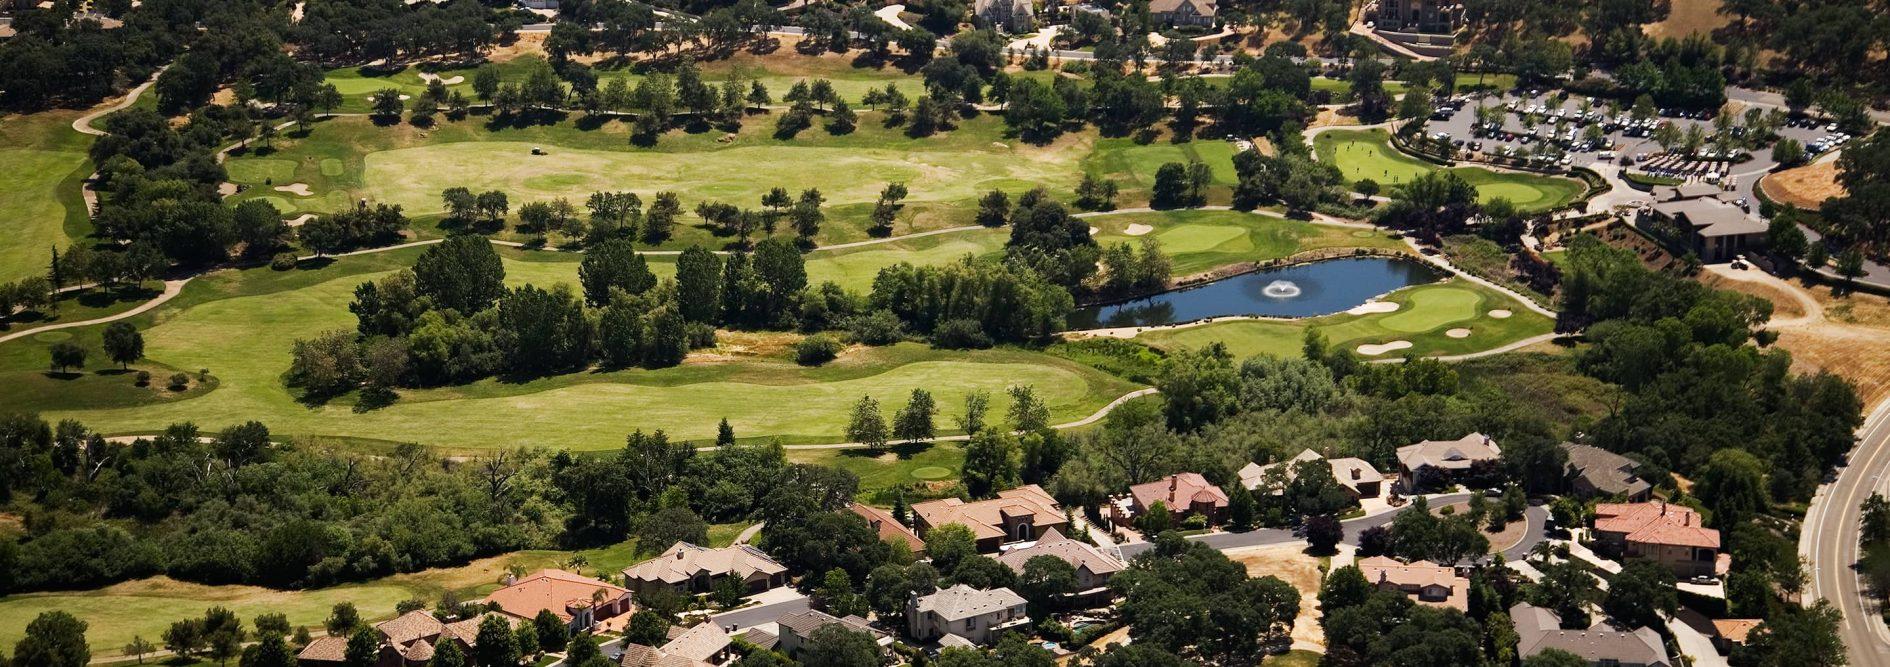 Whitney Oaks Country Club Community in Rocklin, CA